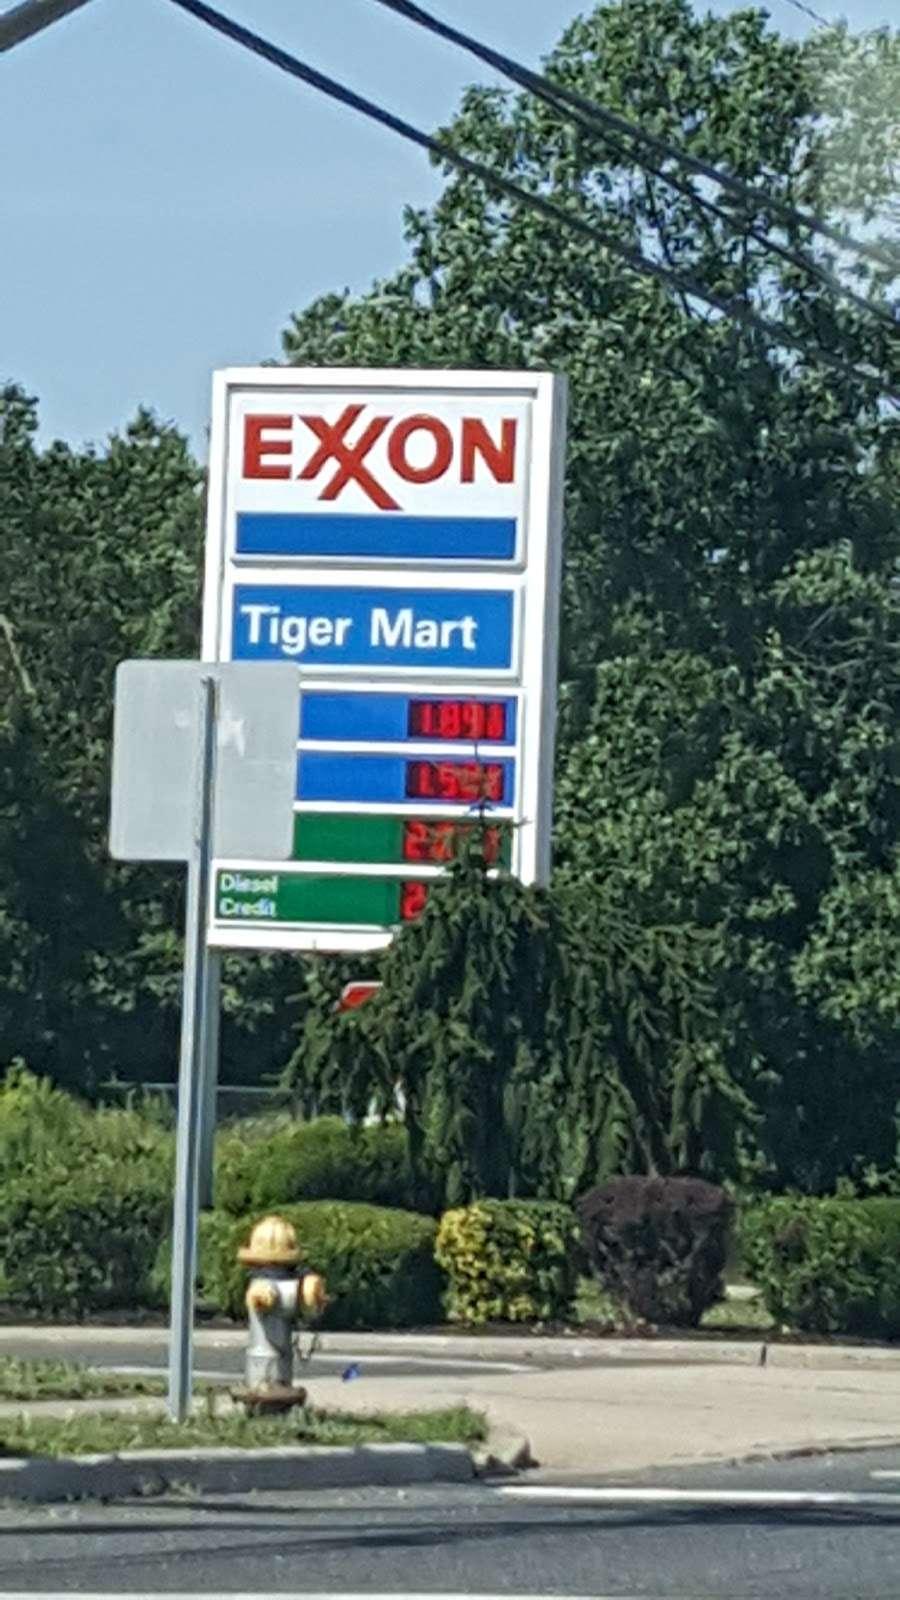 Exxon - Gas station | 2096 Lakewood Rd, Toms River, NJ 08755